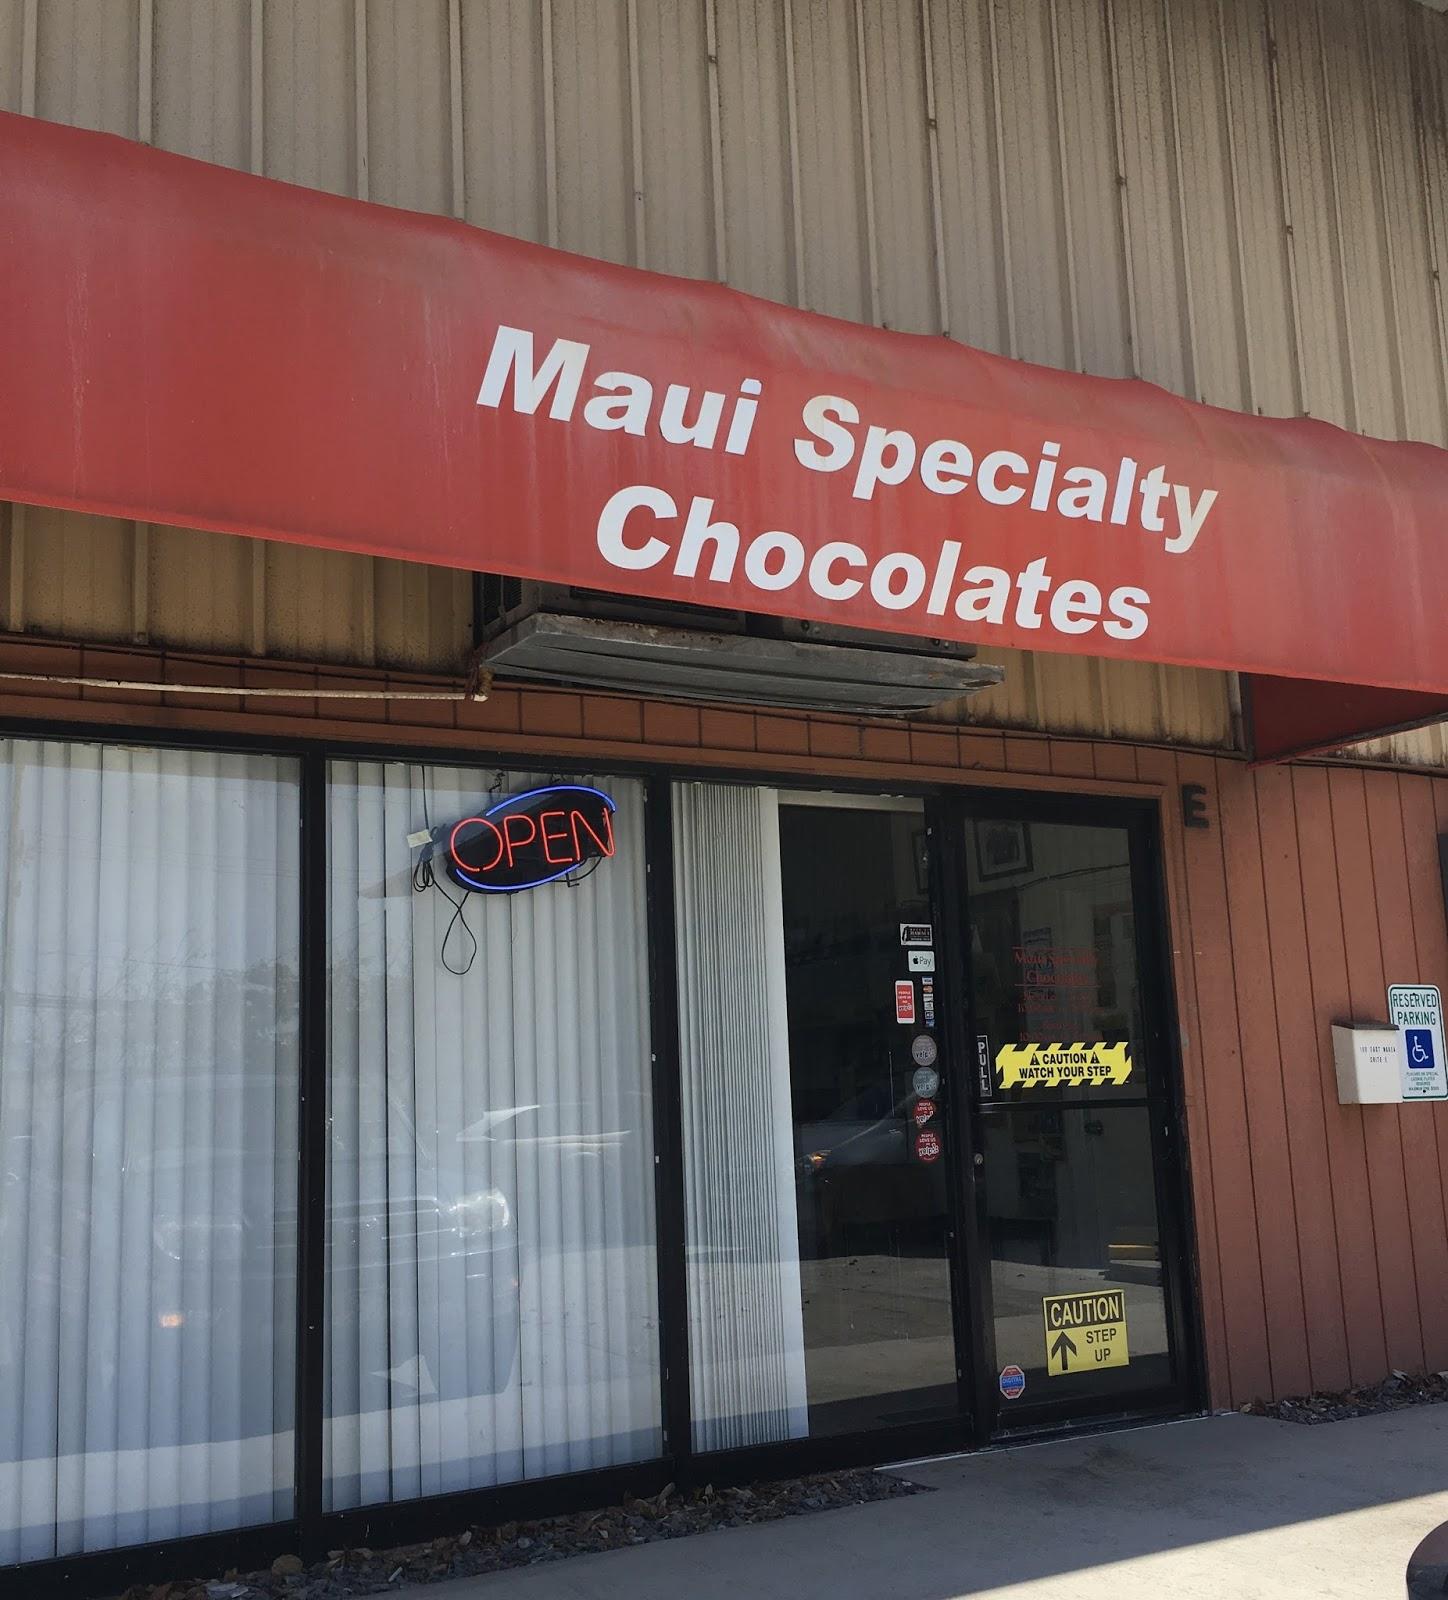 TASTE OF HAWAII: MAUI SPECIALTY CHOCOLATES